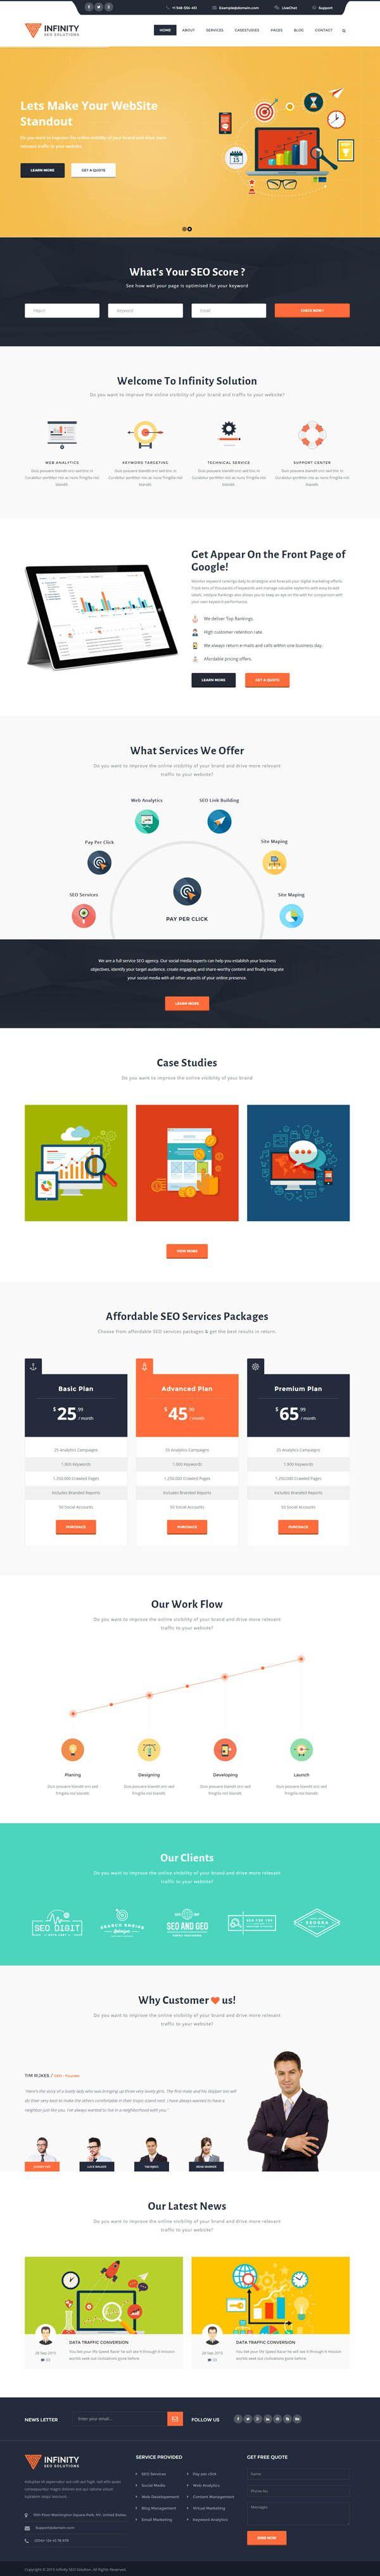 New Html5 Website Templates Psd Html Design Graphic Design Junction Psd Templates Templates Web Development Design